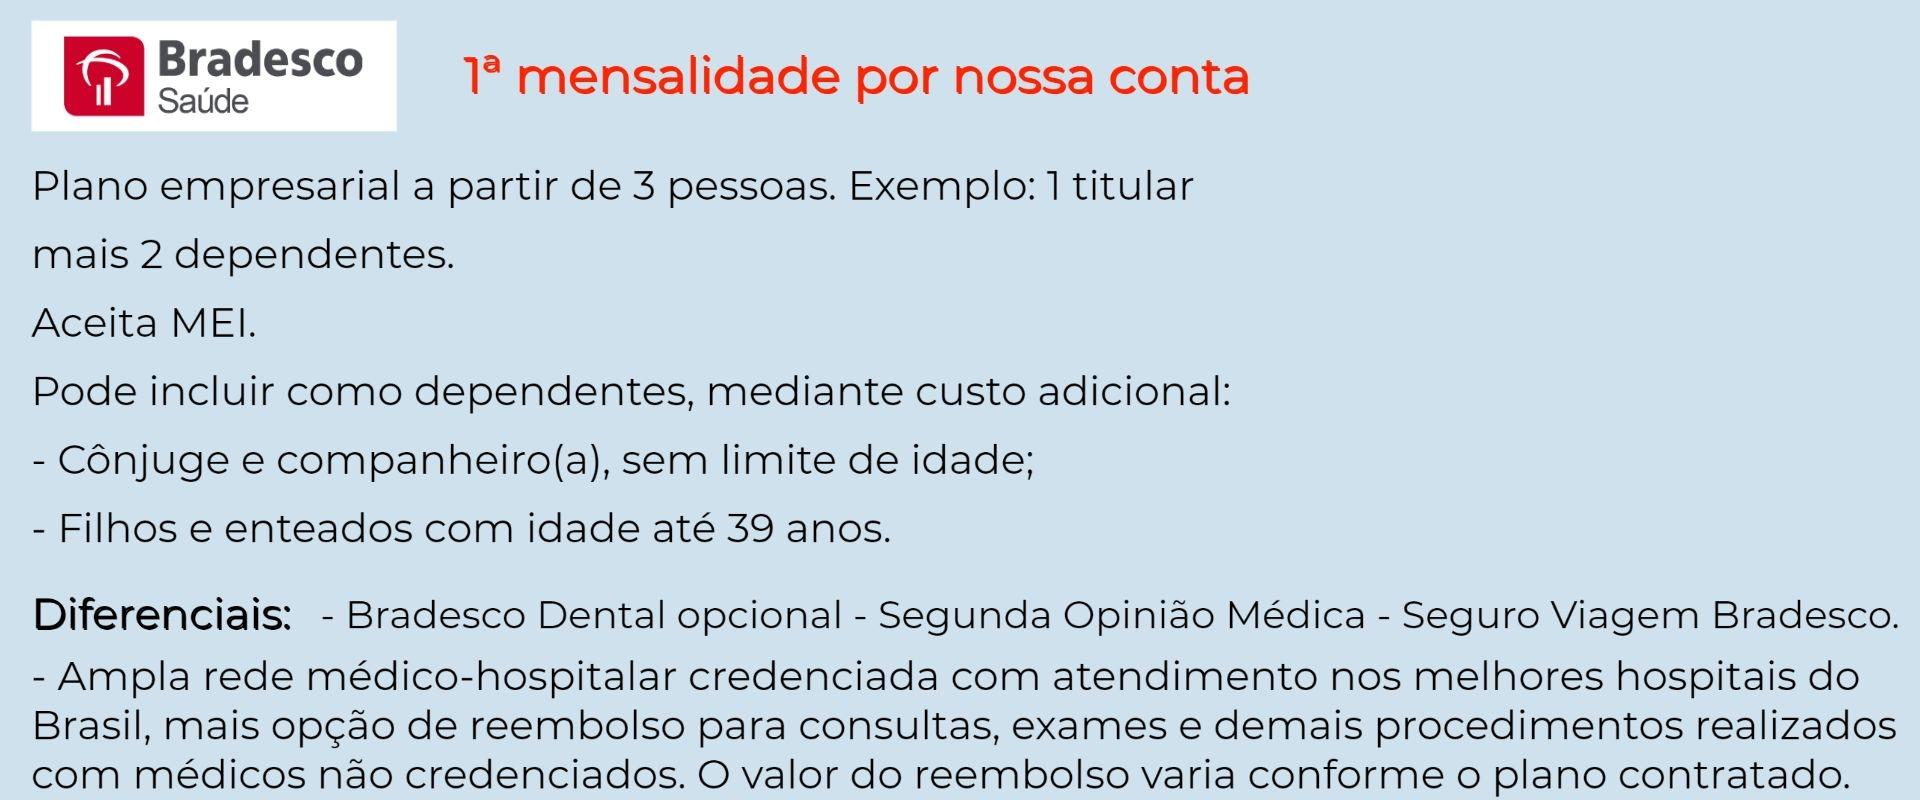 Bradesco Saúde Empresarial - Jales